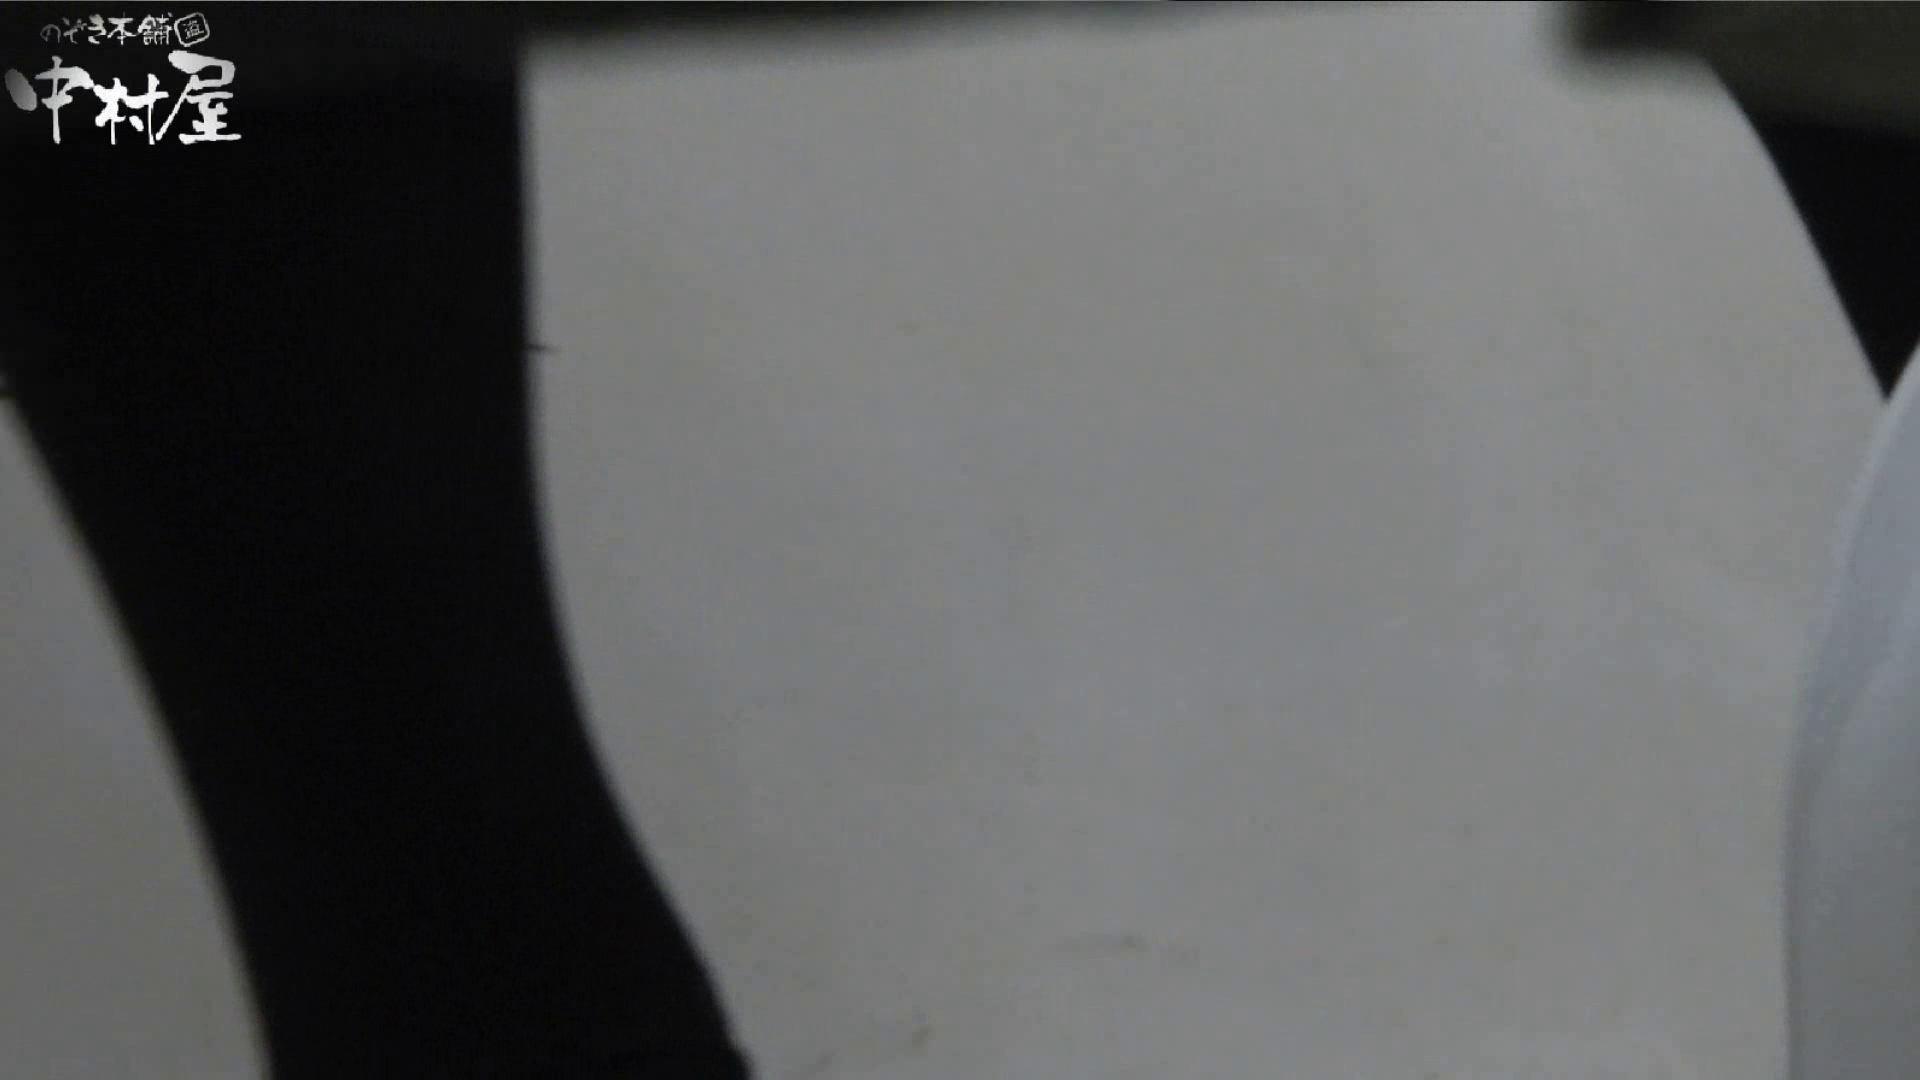 vol.25 命がけ潜伏洗面所! 咥えタオルは剛毛の証!?後編 潜入 われめAV動画紹介 61連発 18